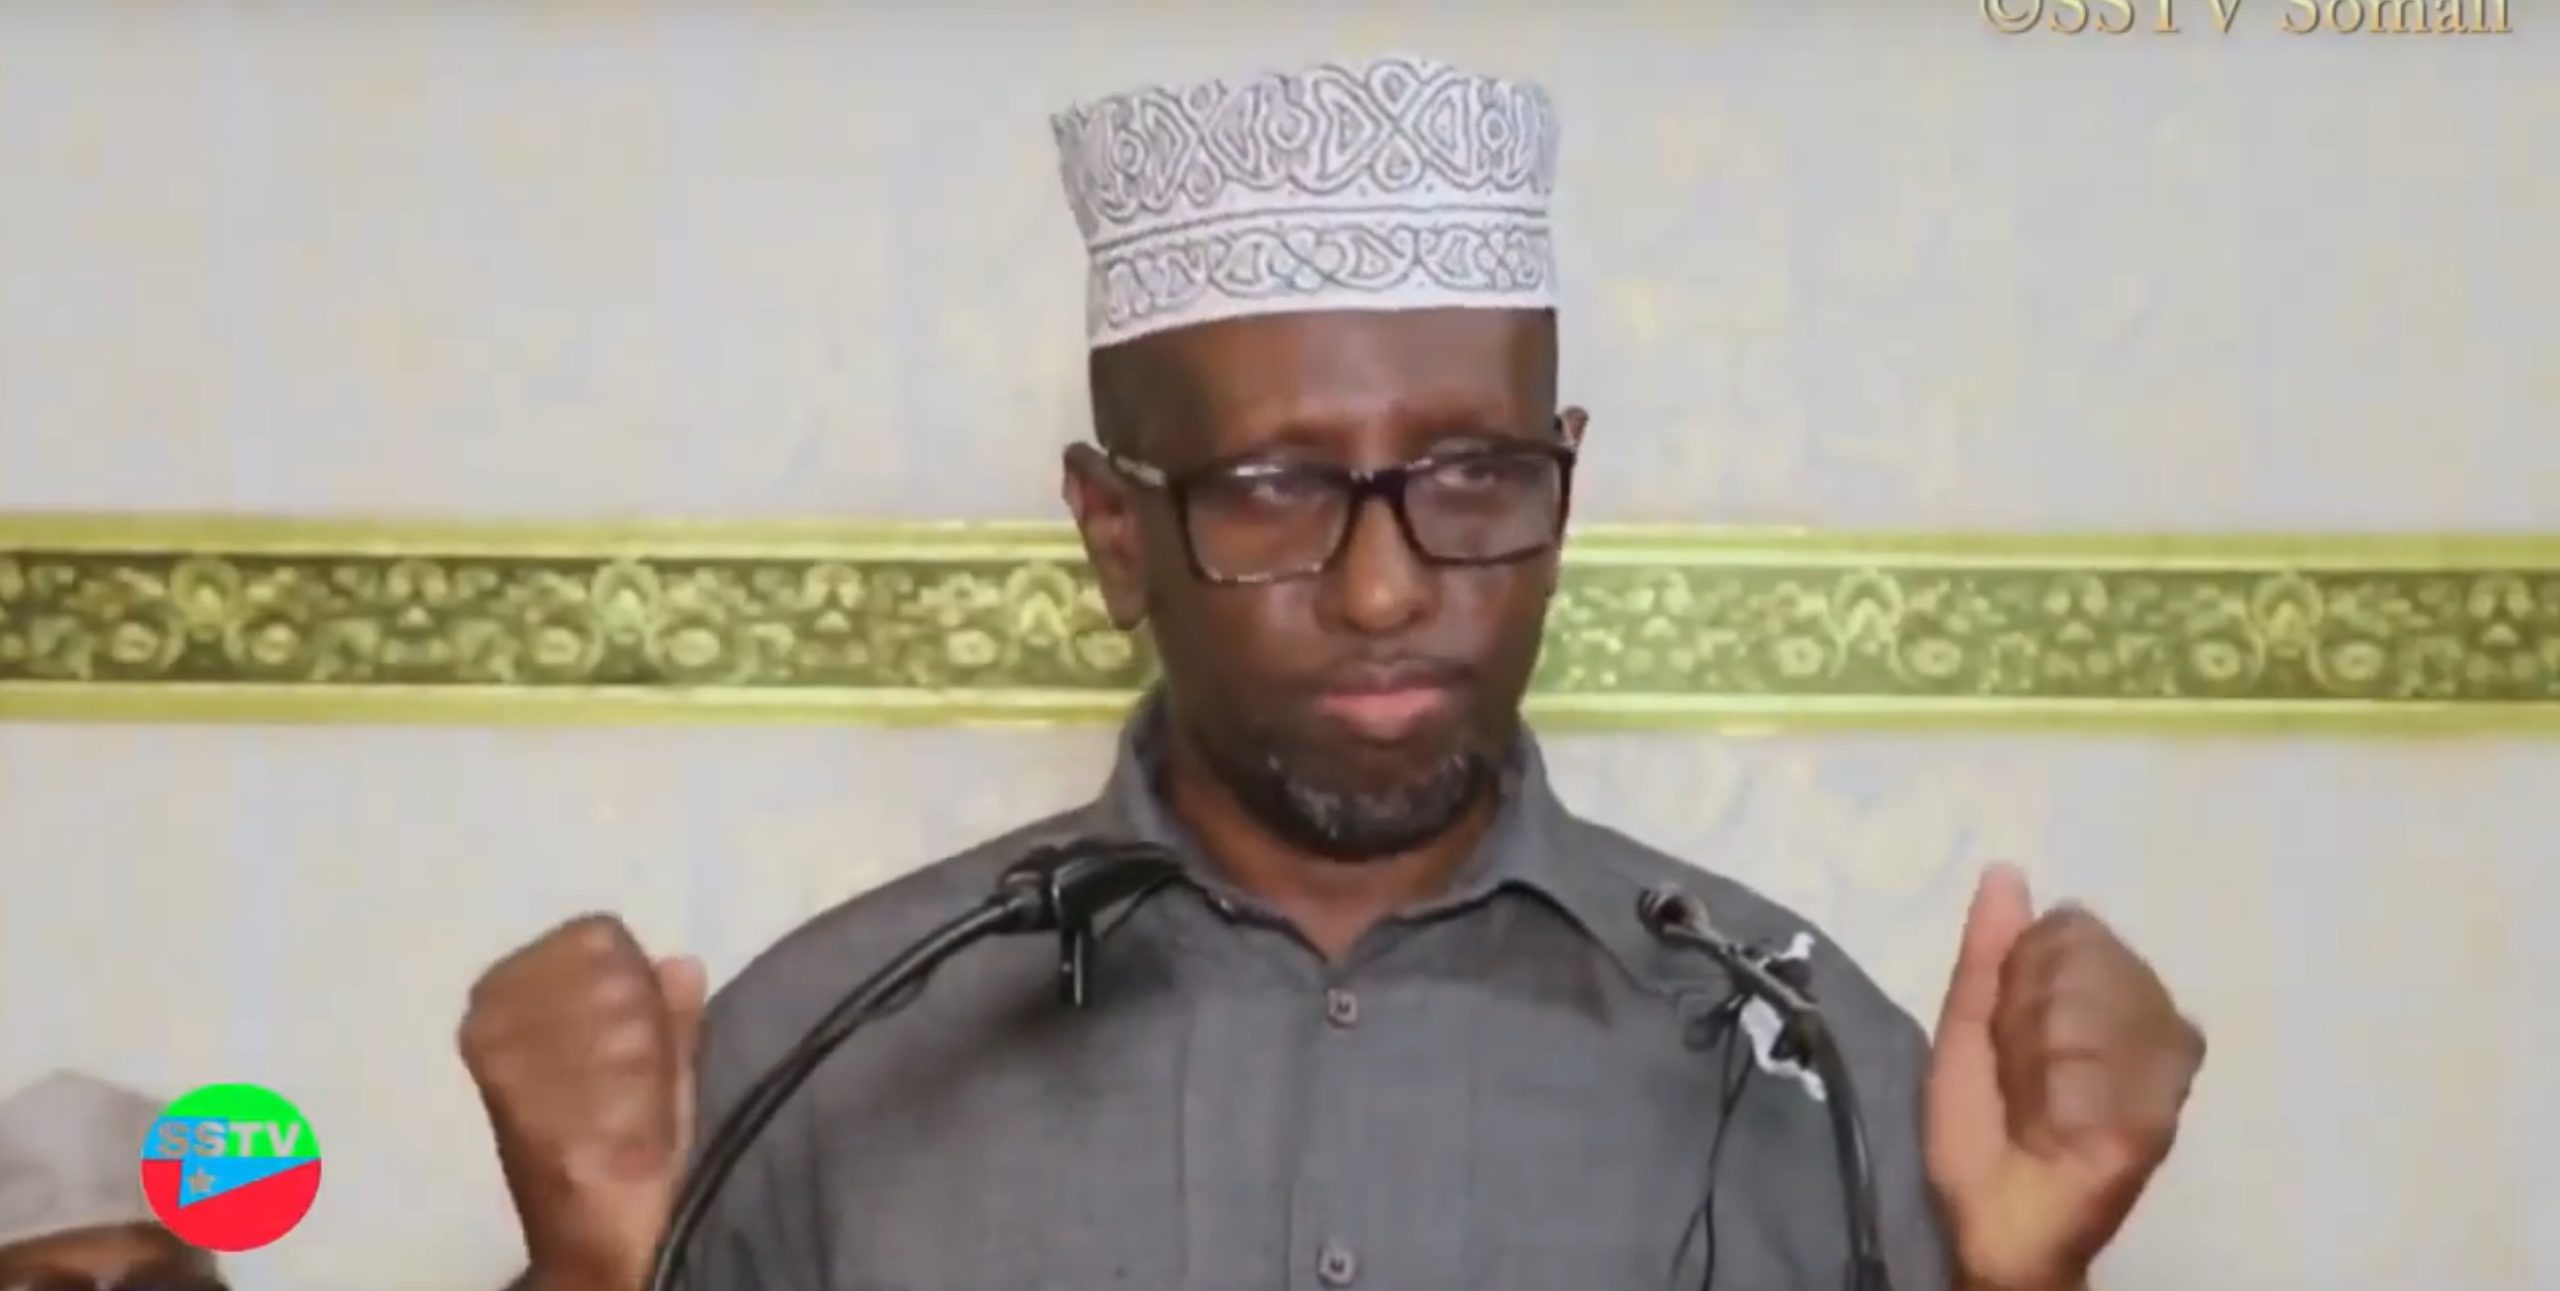 Sharif Sheikh Ahmed, former President of Somalia